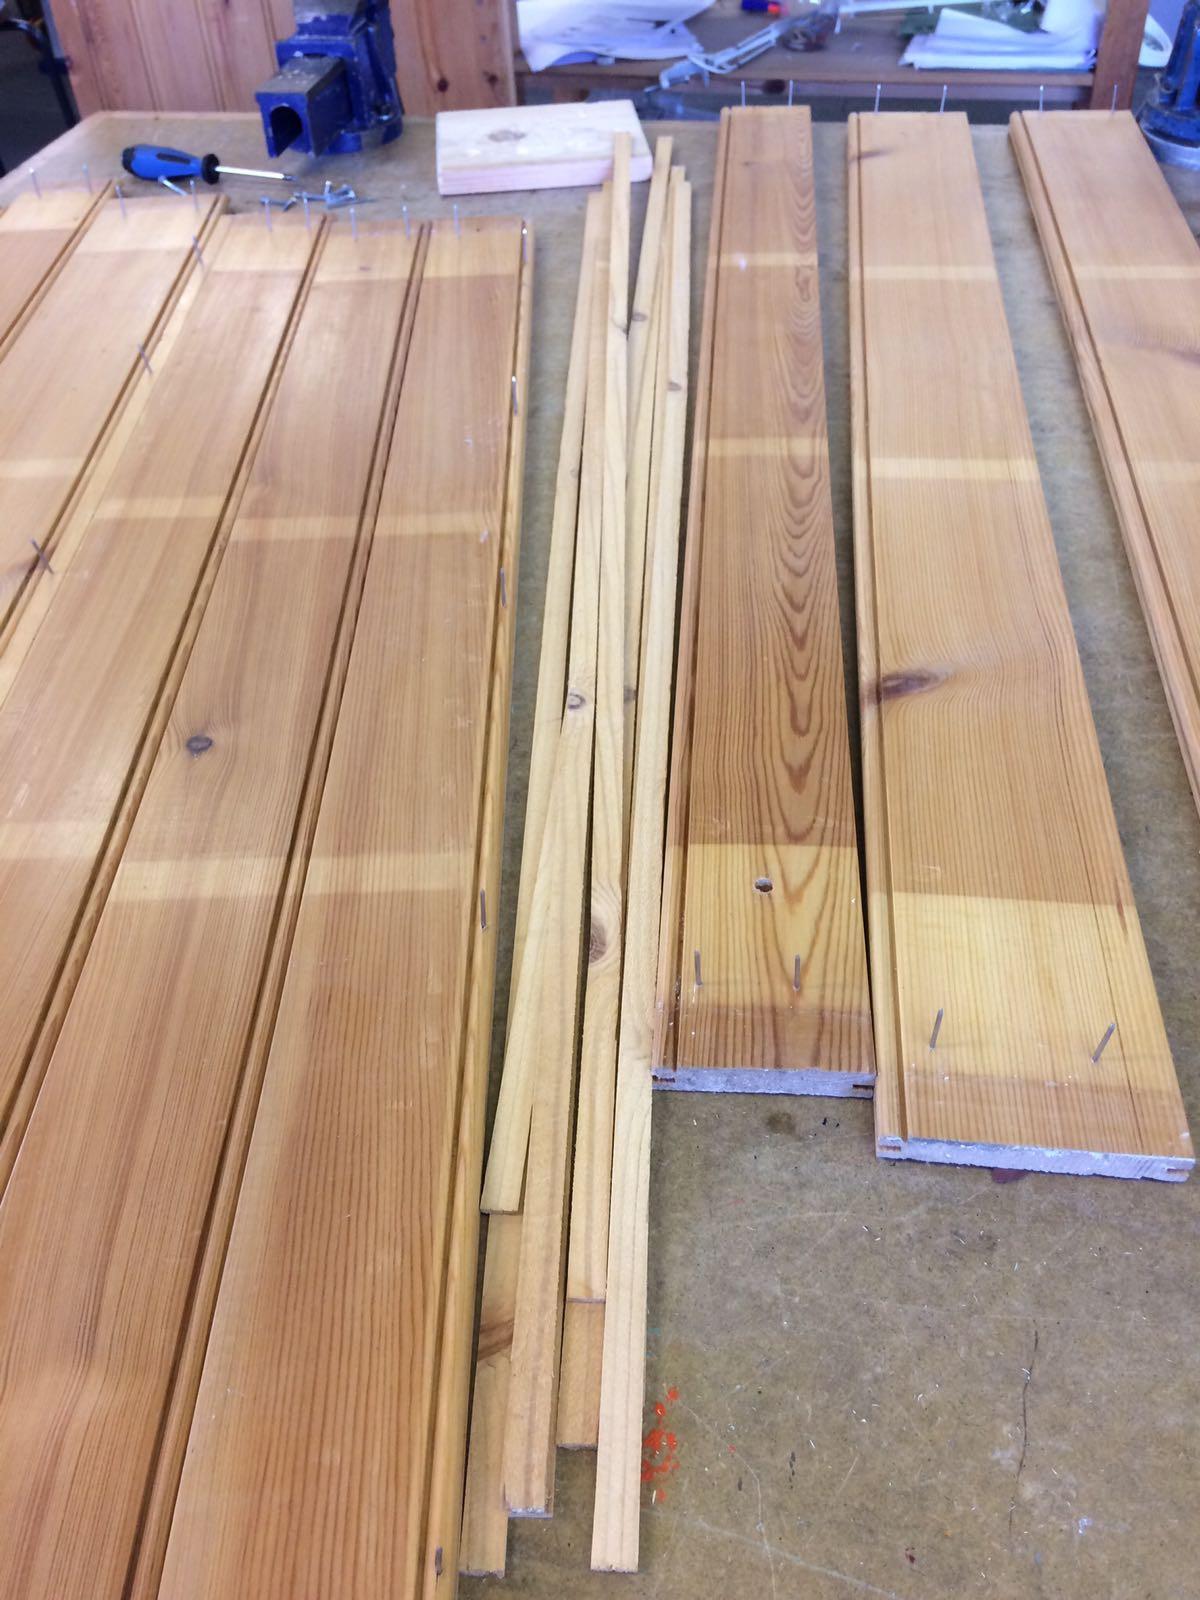 hardwood floor refinishing southeast michigan of http imgur com gallery rwr0h daily http imgur com p0wiq8l this for 5rxkesl